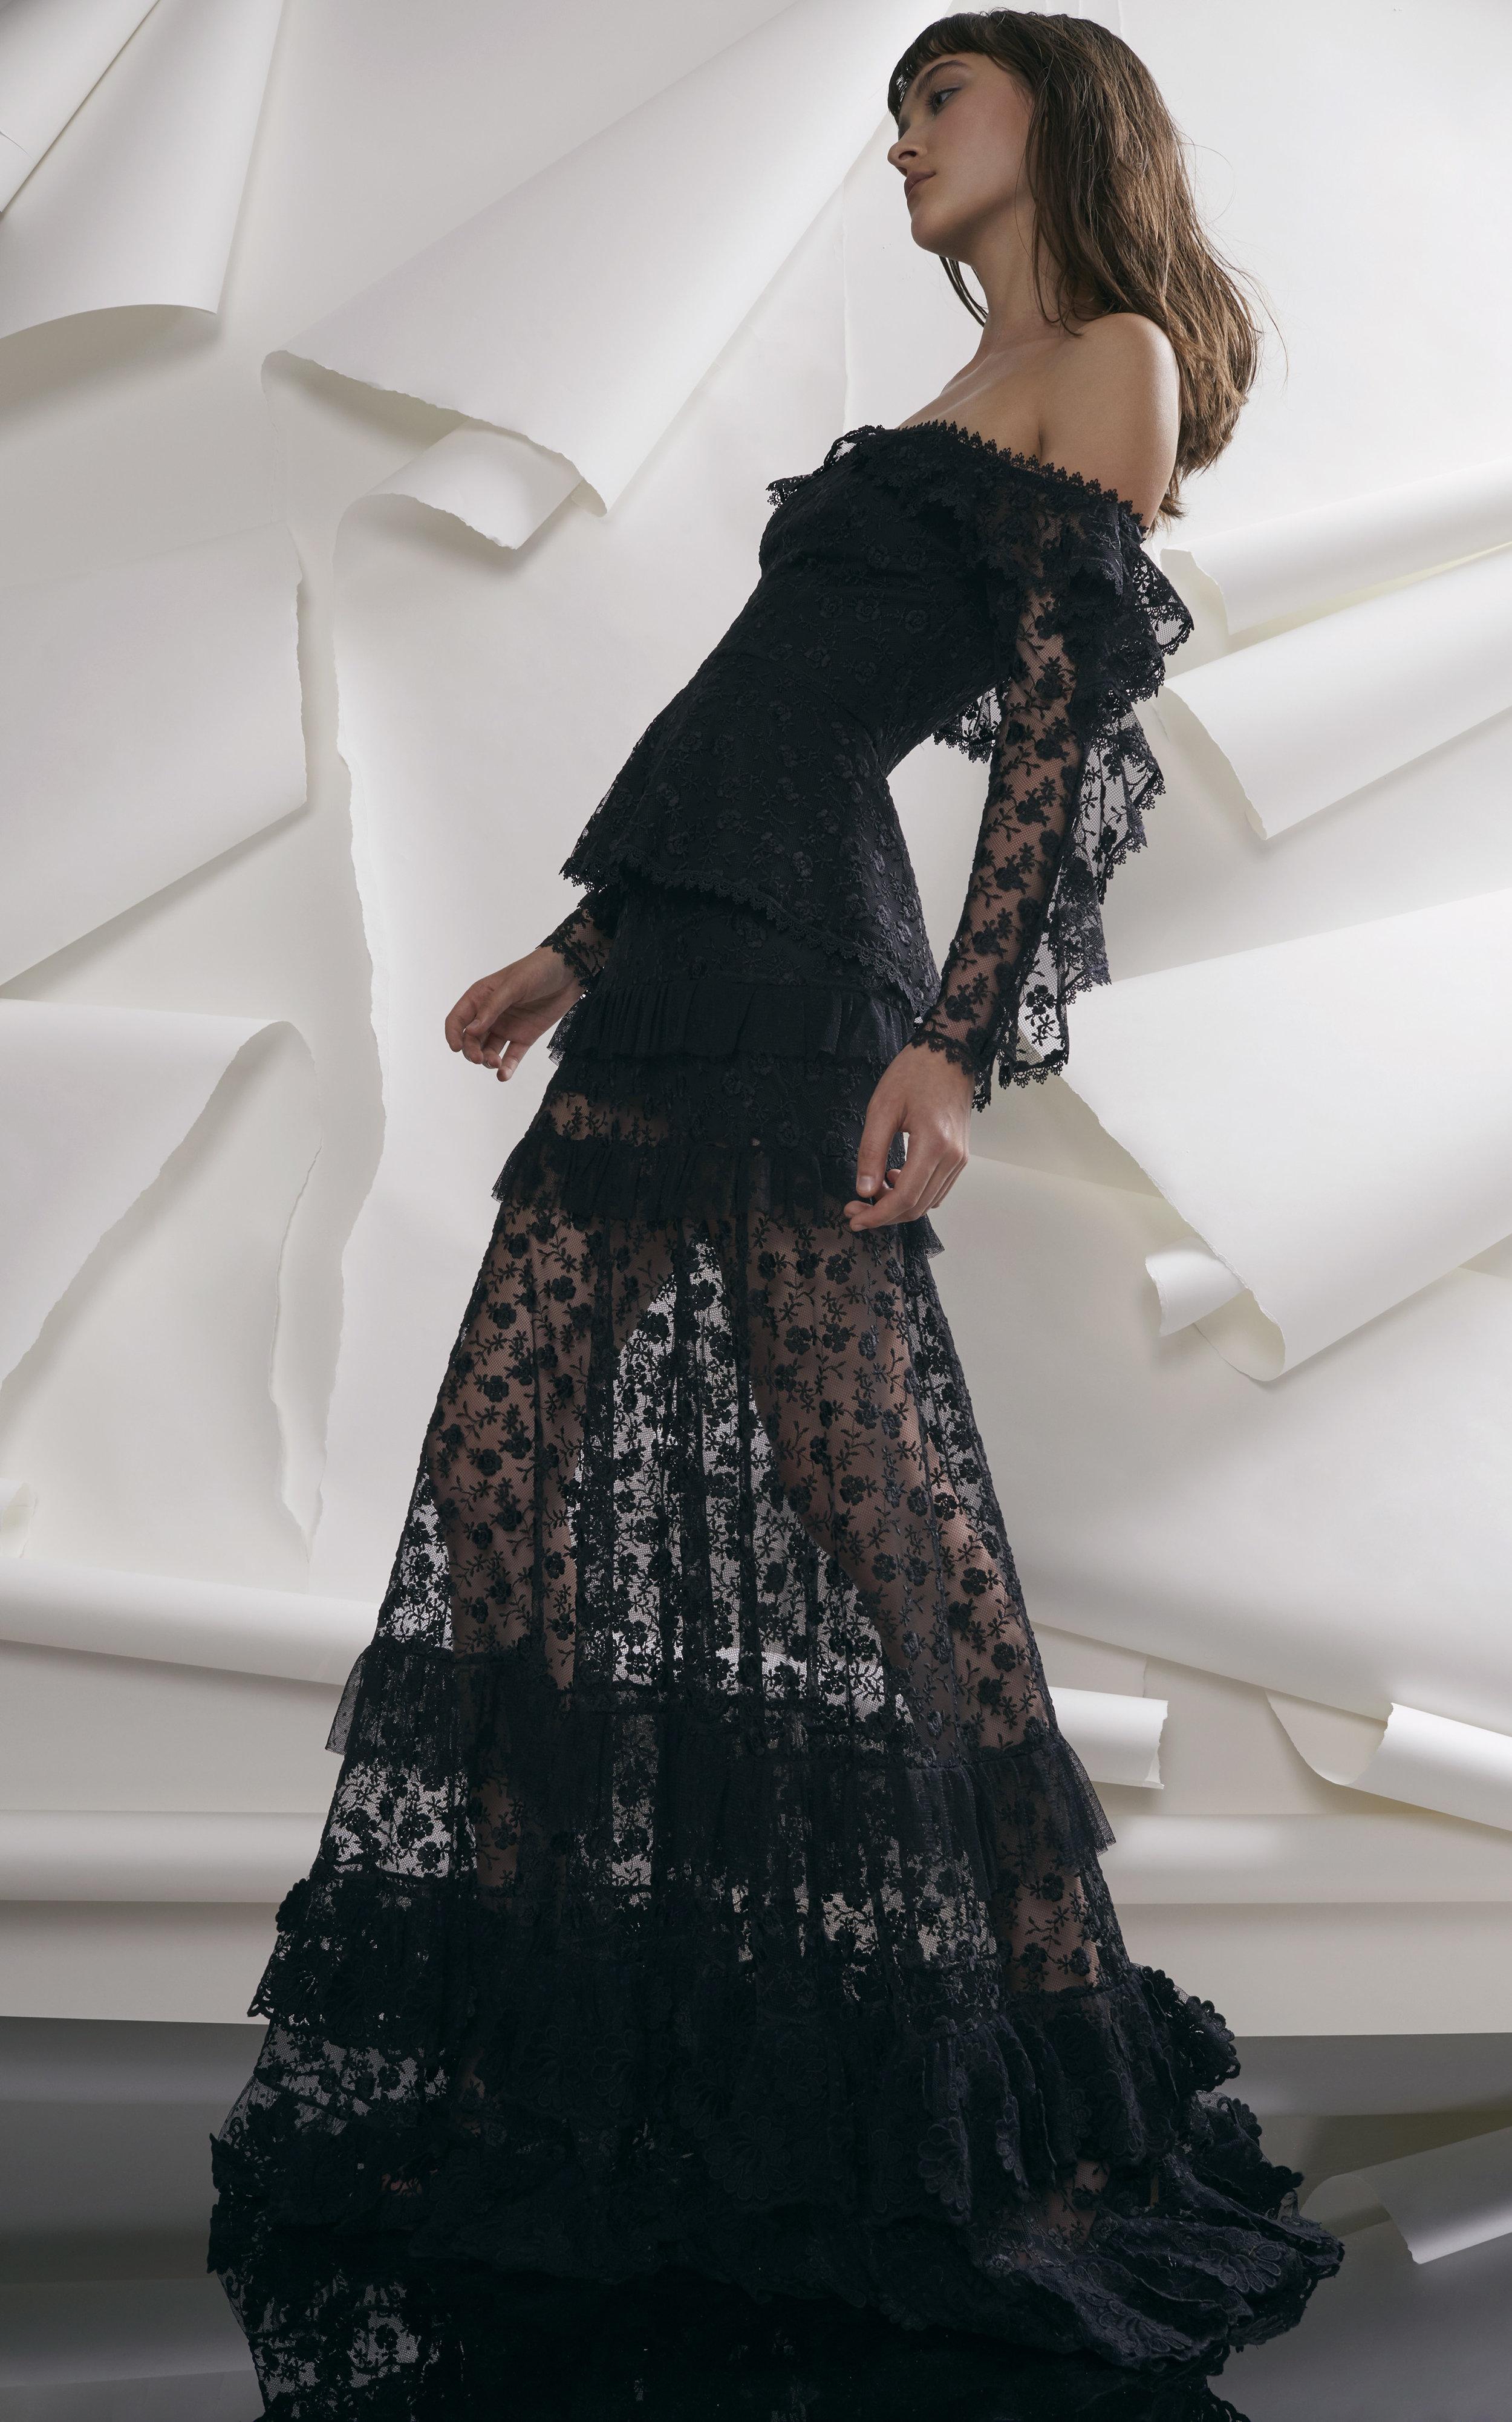 Alexis for Moda Operandi